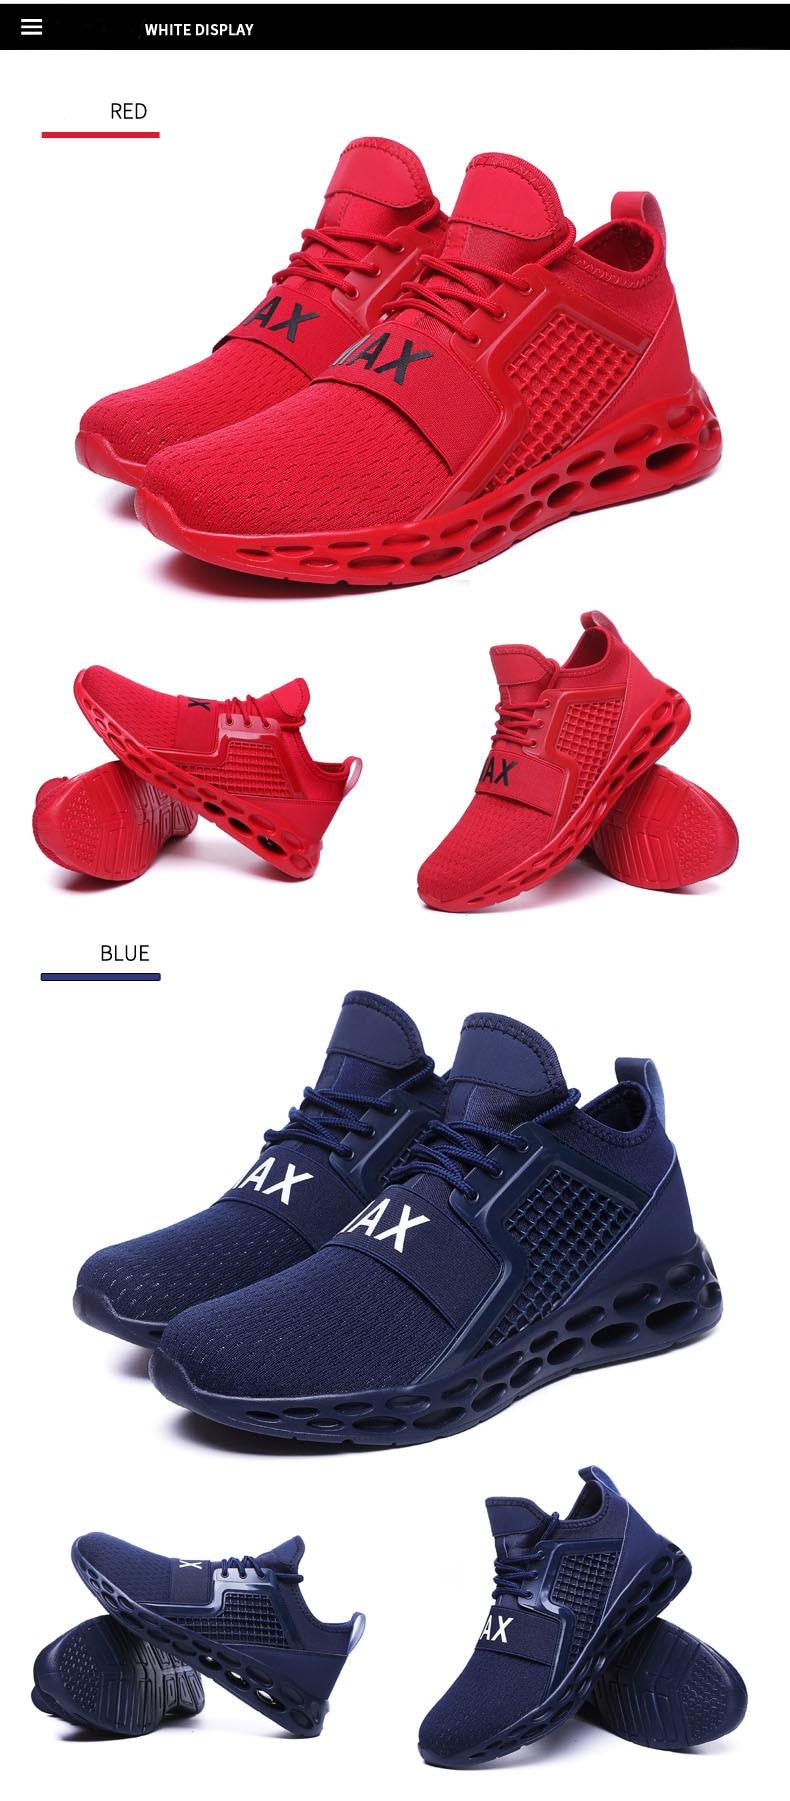 H166580fc5c7e430fb332993fd43c8093U BomKinta Stylish Designer Casual Shoes Men Yellow Sneakers Black White Walking Footwear Breathable Mesh Sneakers Men Shoes